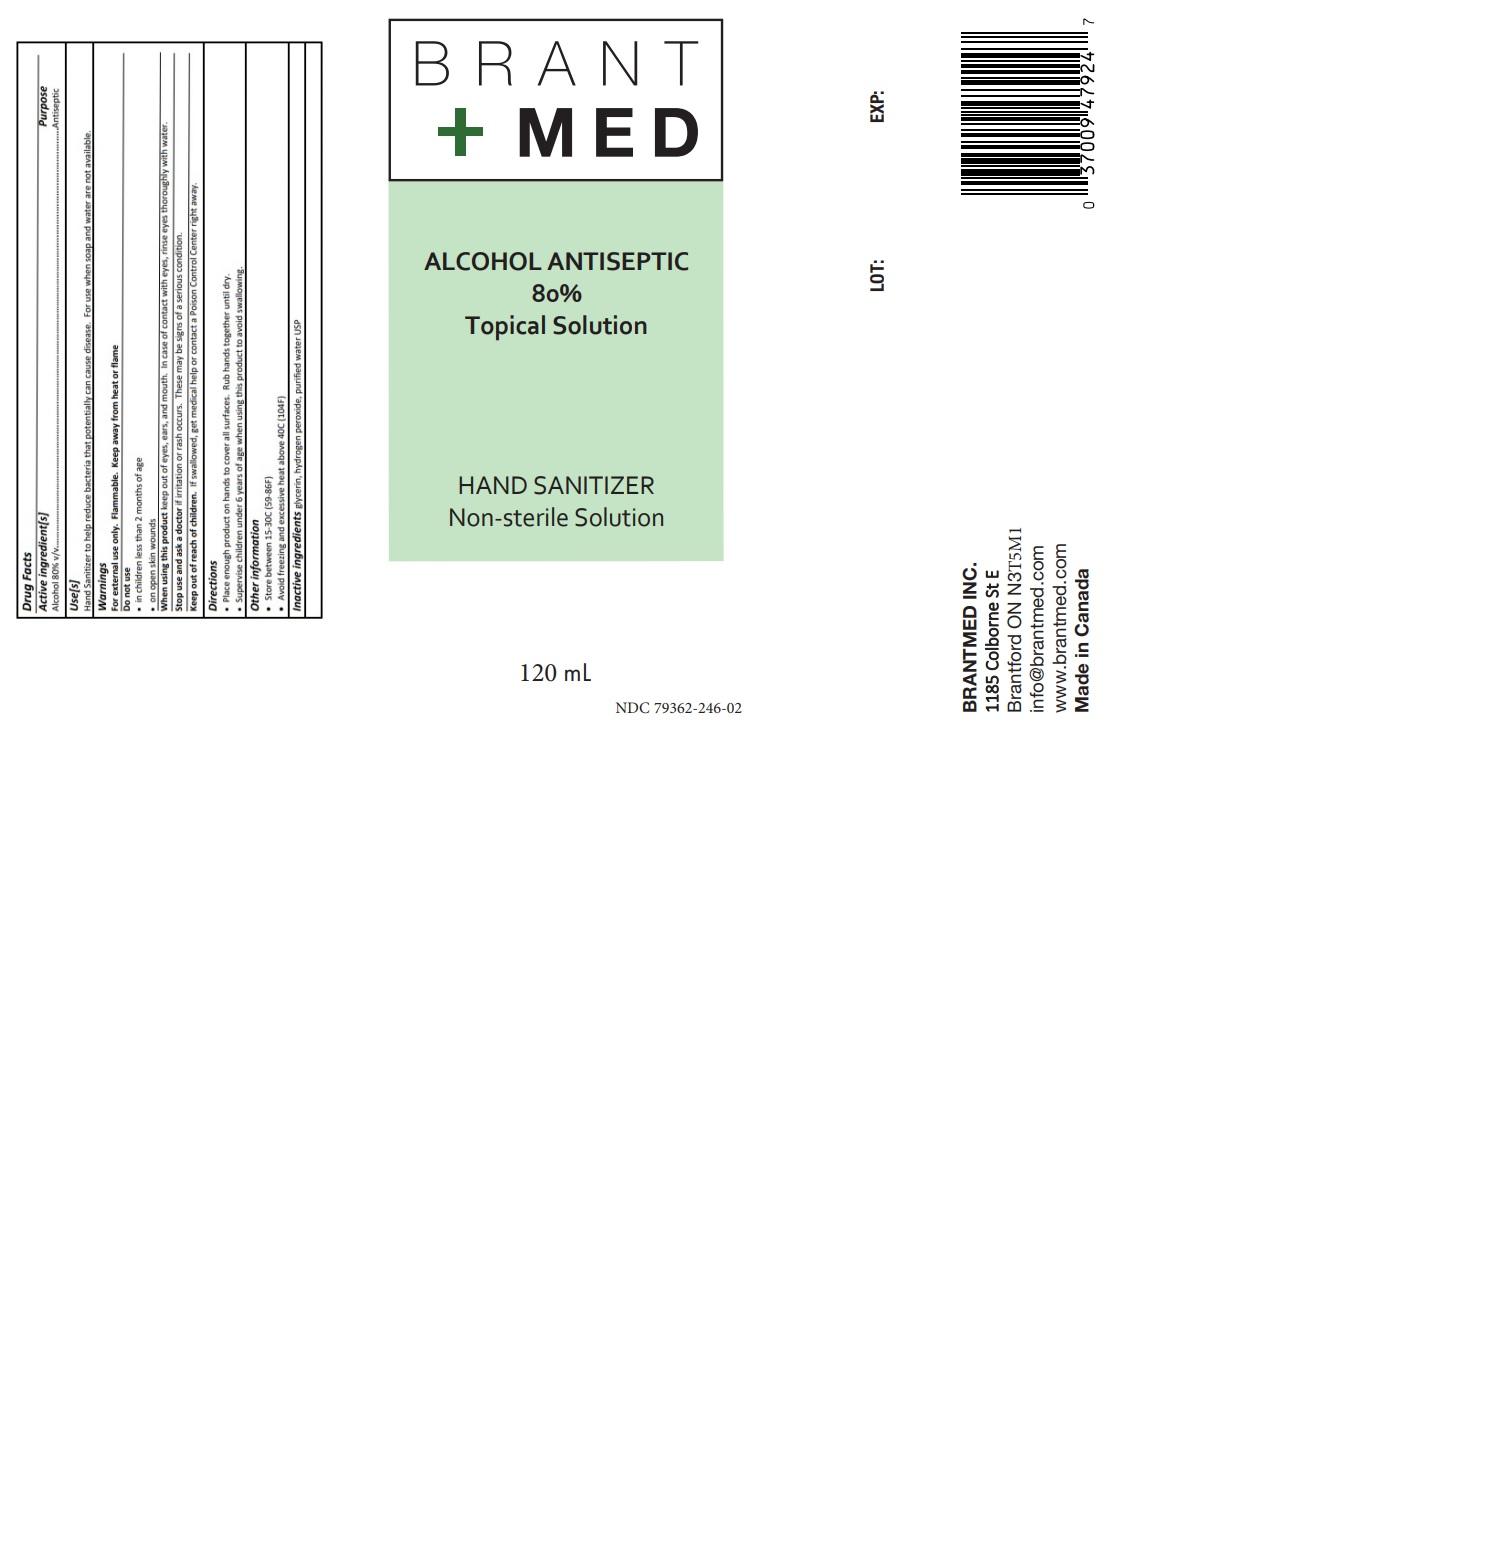 120 ml label